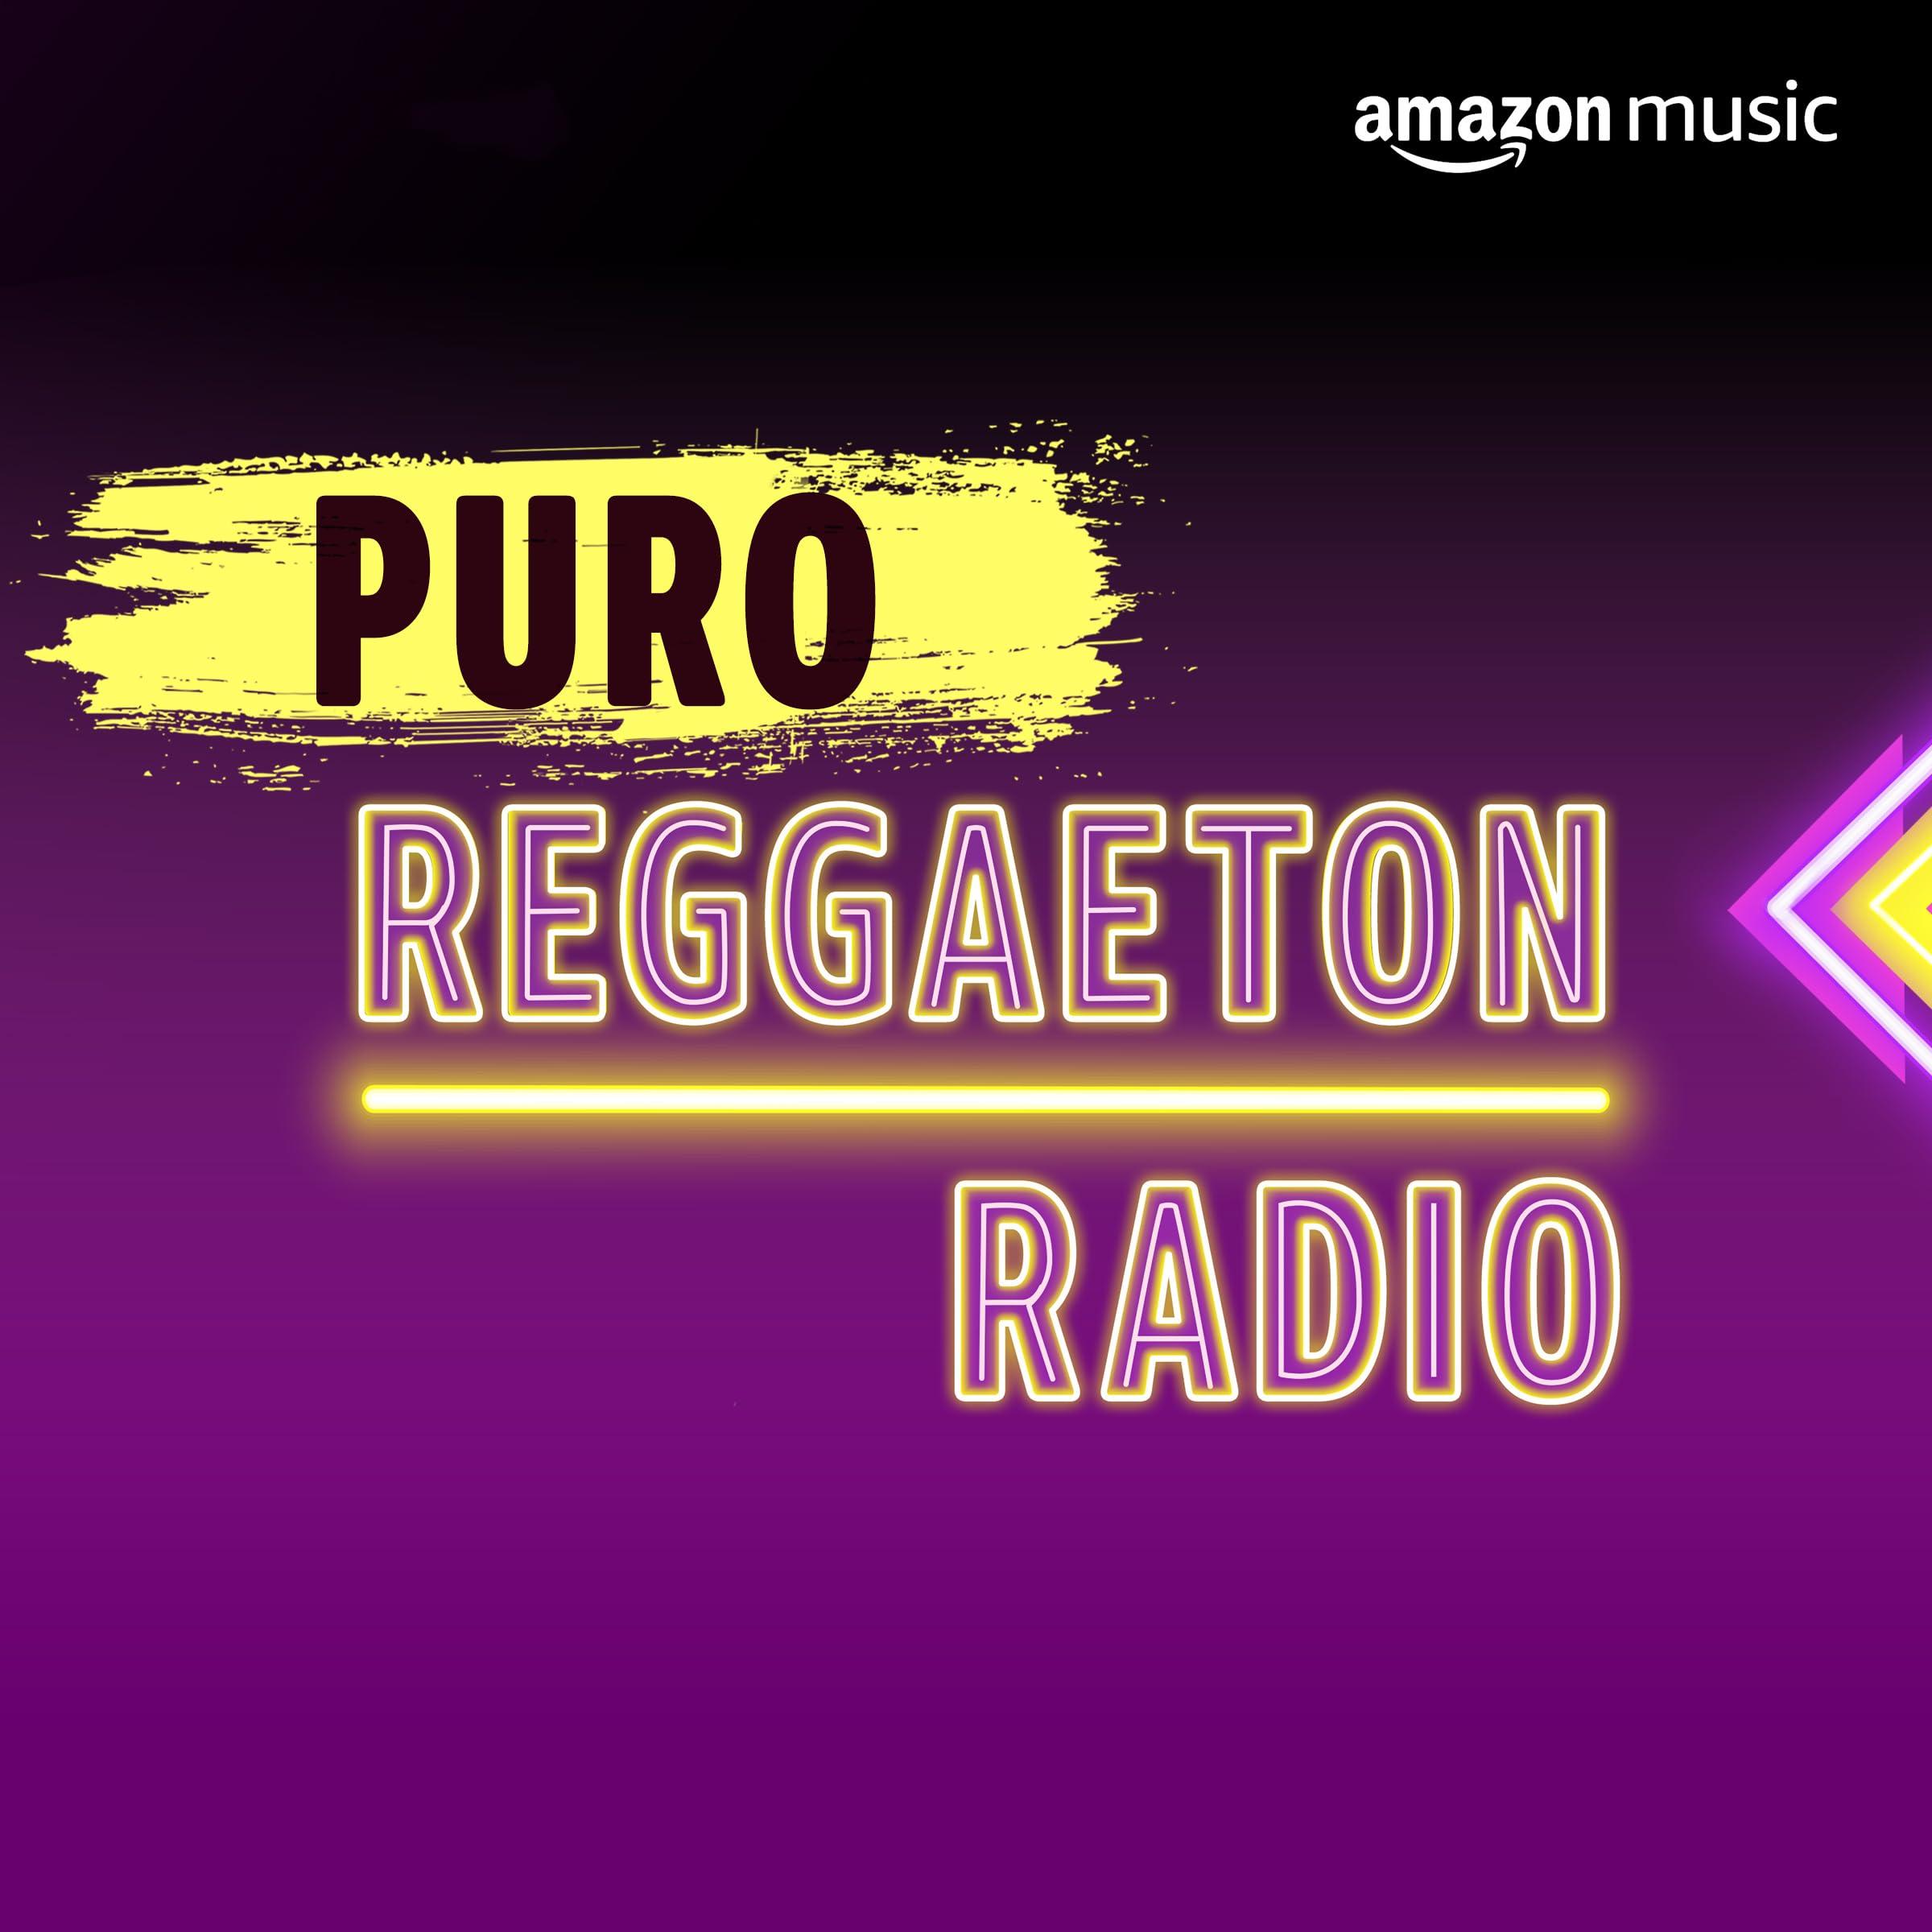 Puro Reggaeton Radio